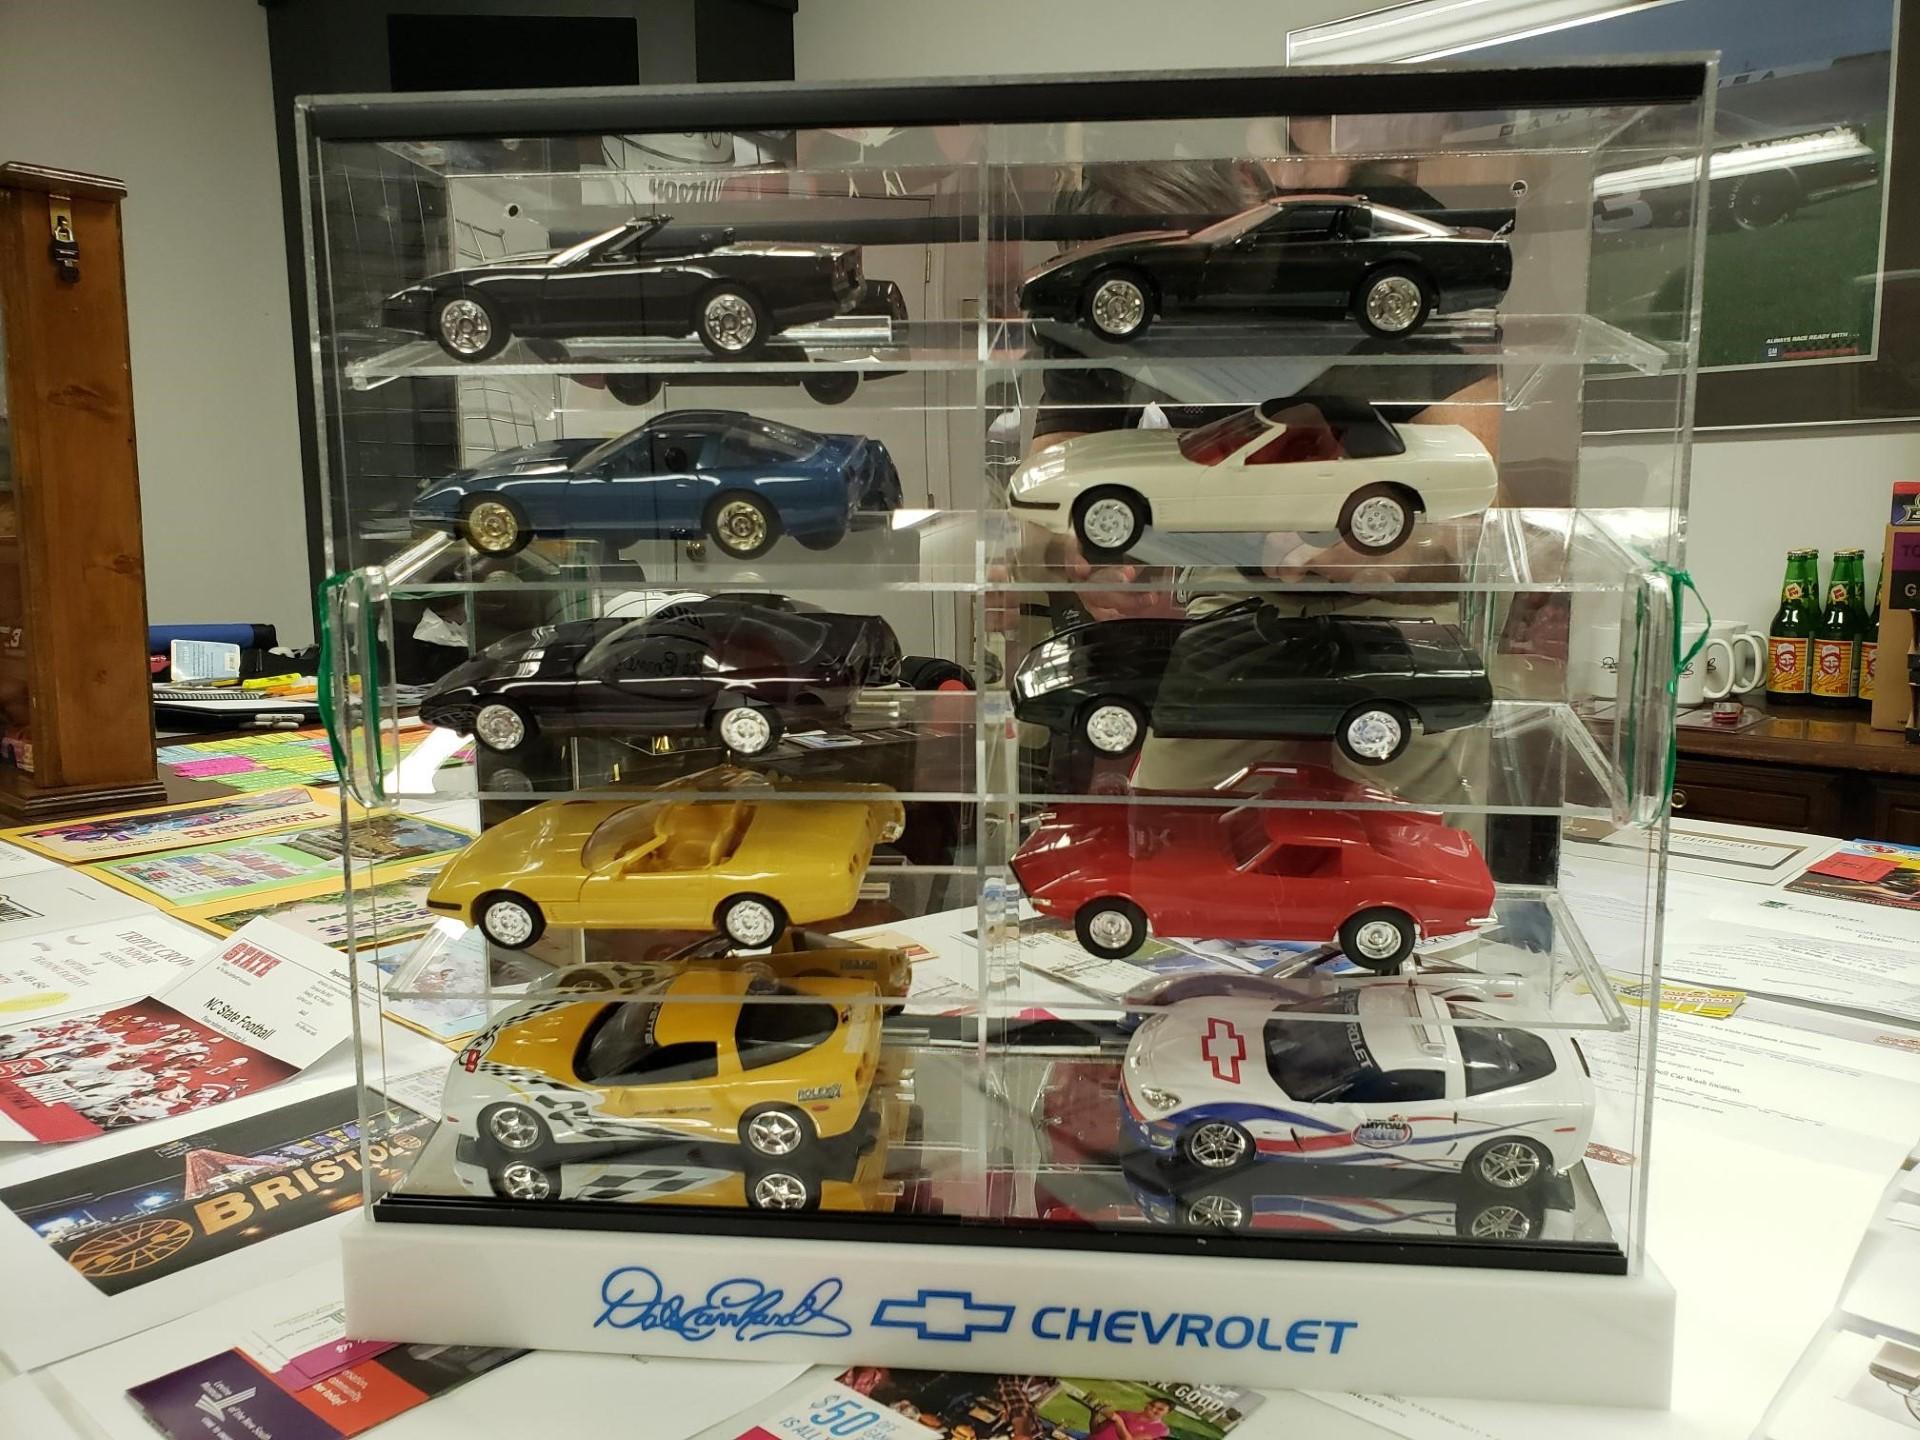 Promo Chevy Corvette Die Casts in Dale Earnhardt Chevrolet Case